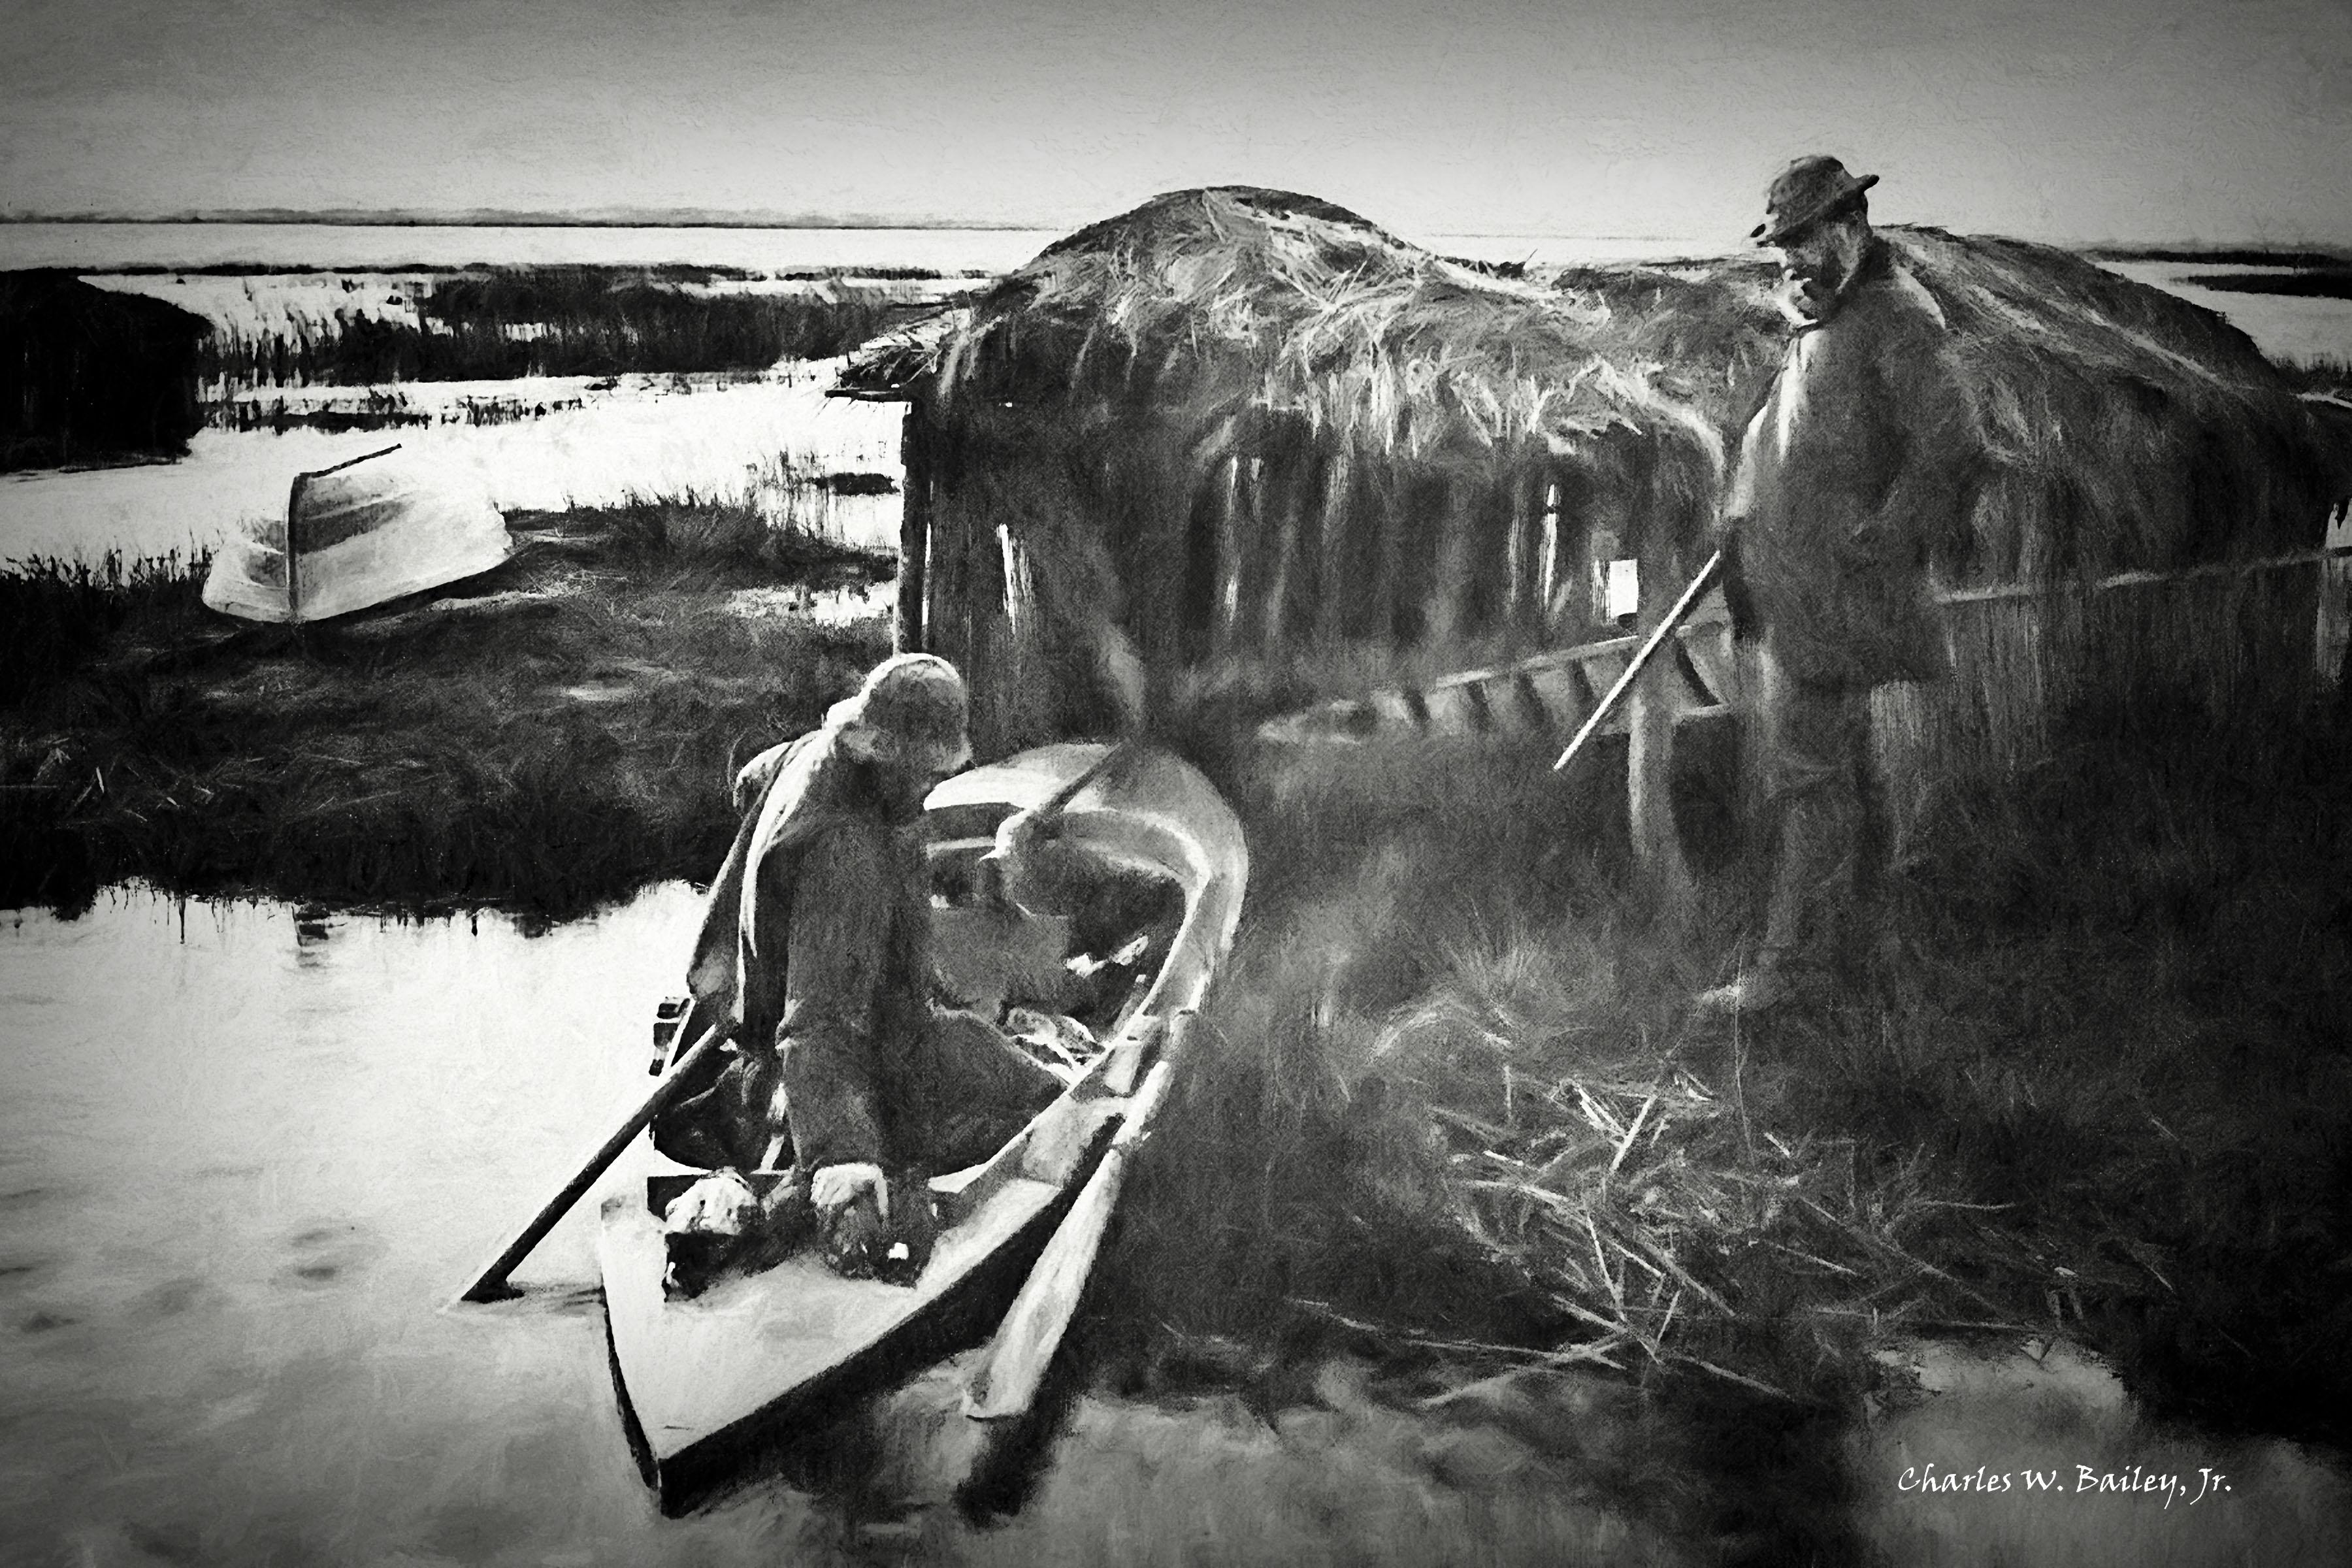 Wallpaper : drawing, Photoshop, boat, birds, lake, vehicle